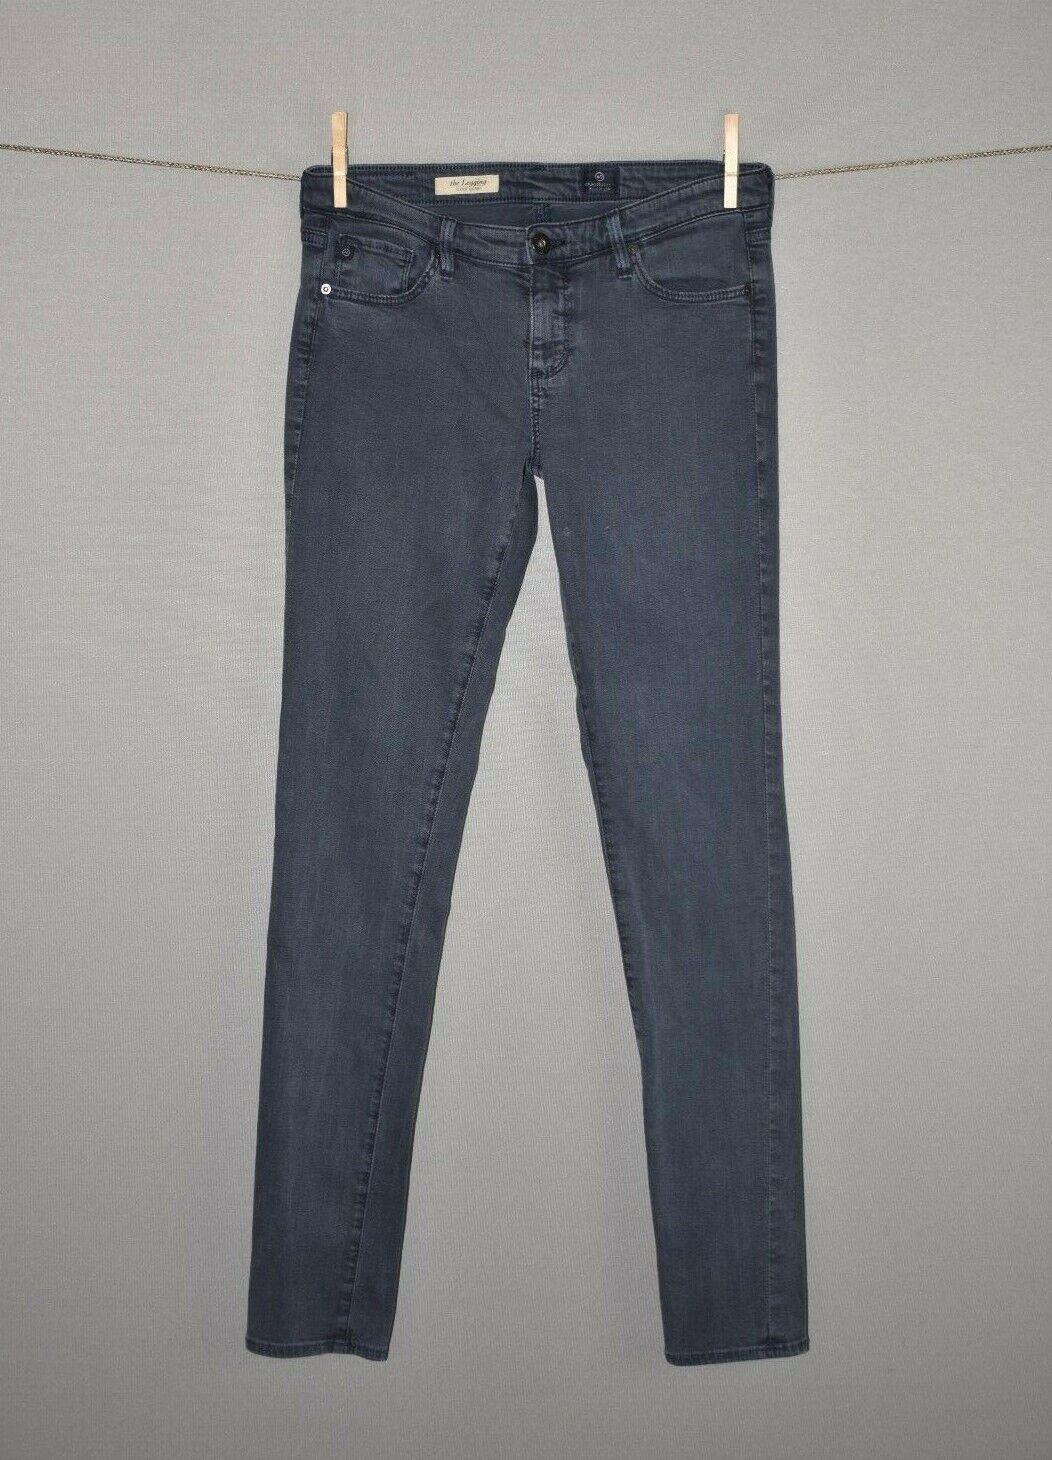 ADRIANO goldSCHMIED  228 The Legging Super Skinny Jean Size 28